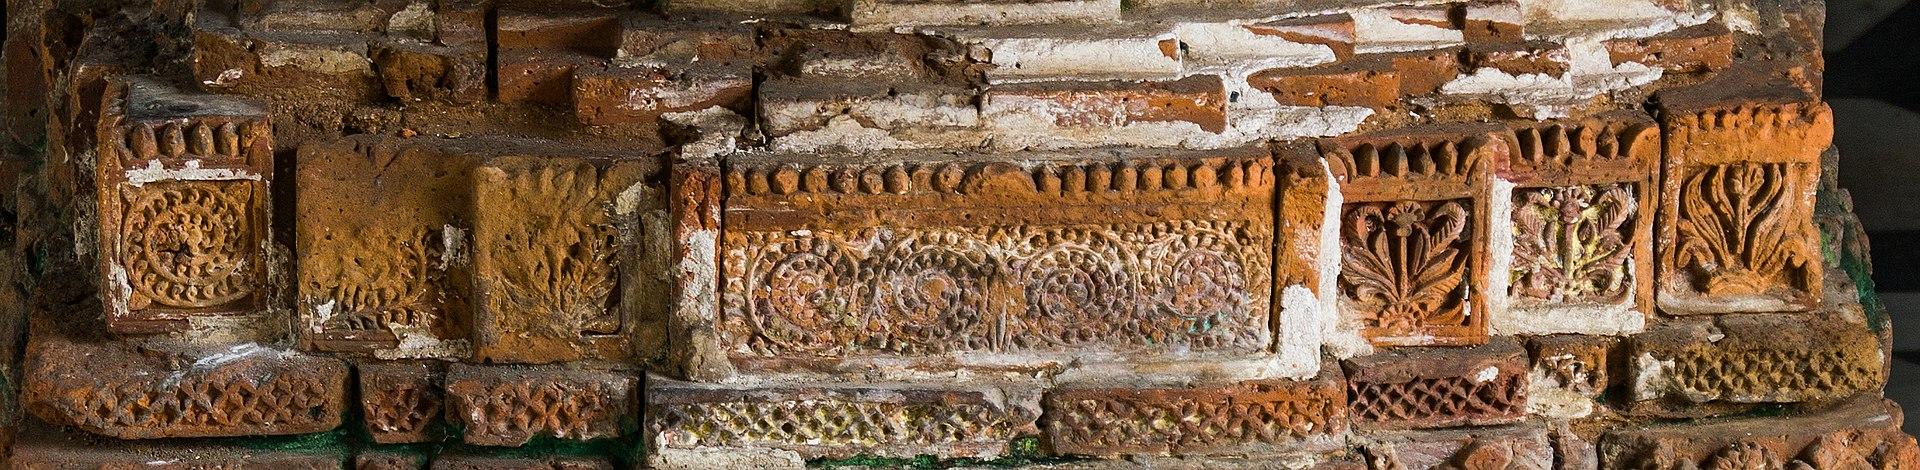 Lalji Temple - Kalna - Inner Panel - 11.jpg